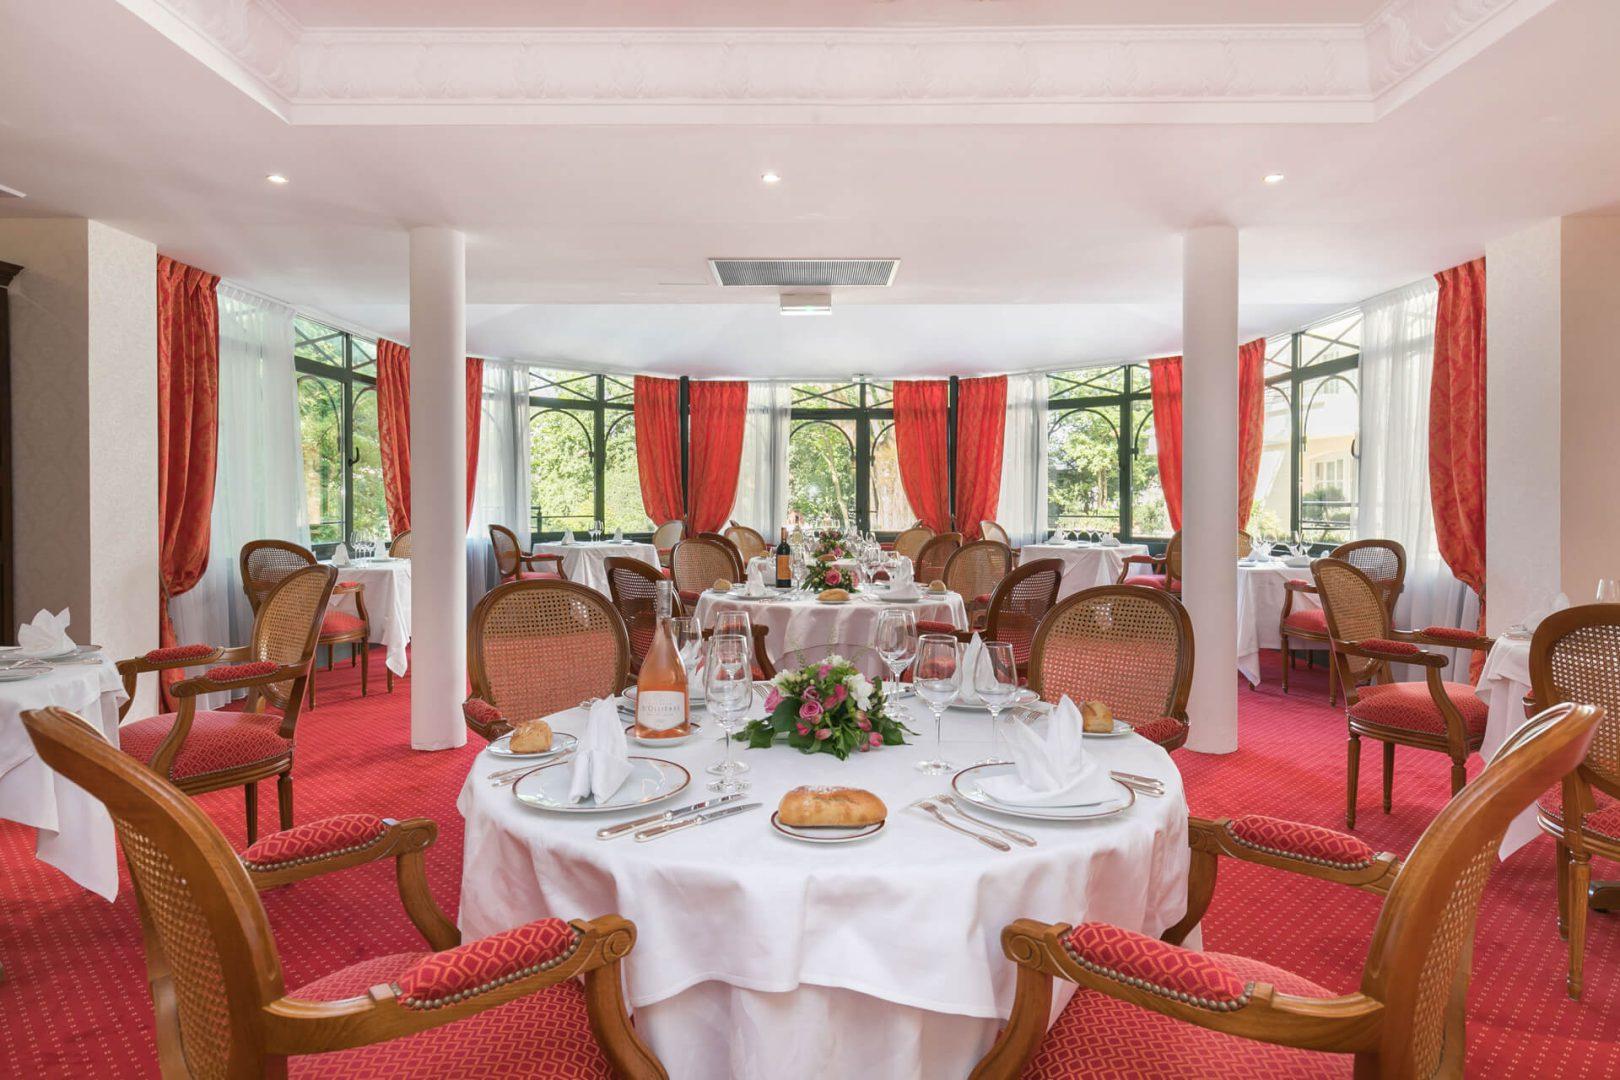 Restaurant de la résidence senior Dijon Villa Médicis